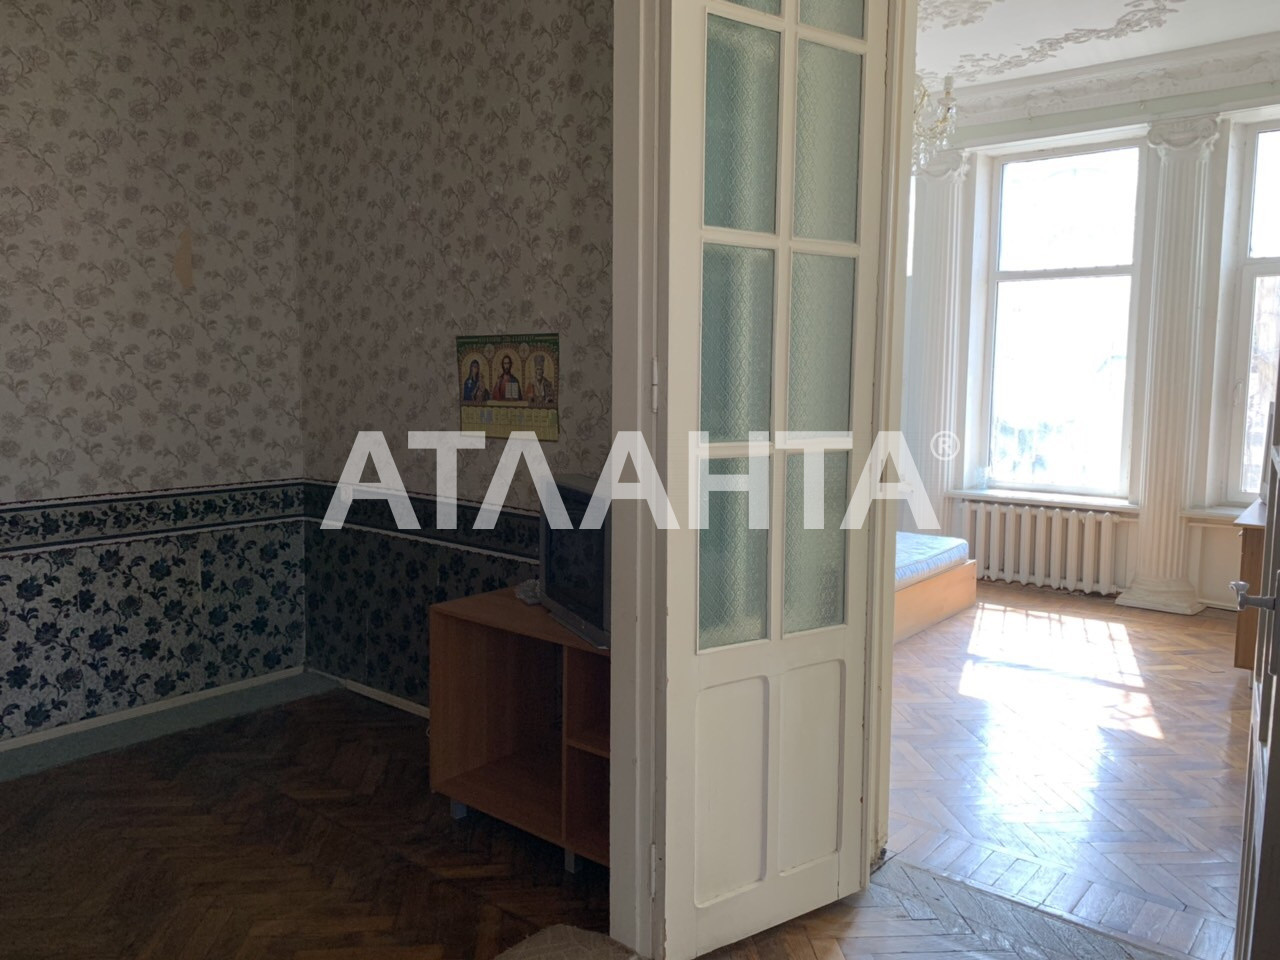 Продается 3-комнатная Квартира на ул. Французский Бул. (Пролетарский Бул.) — 85 000 у.е. (фото №5)